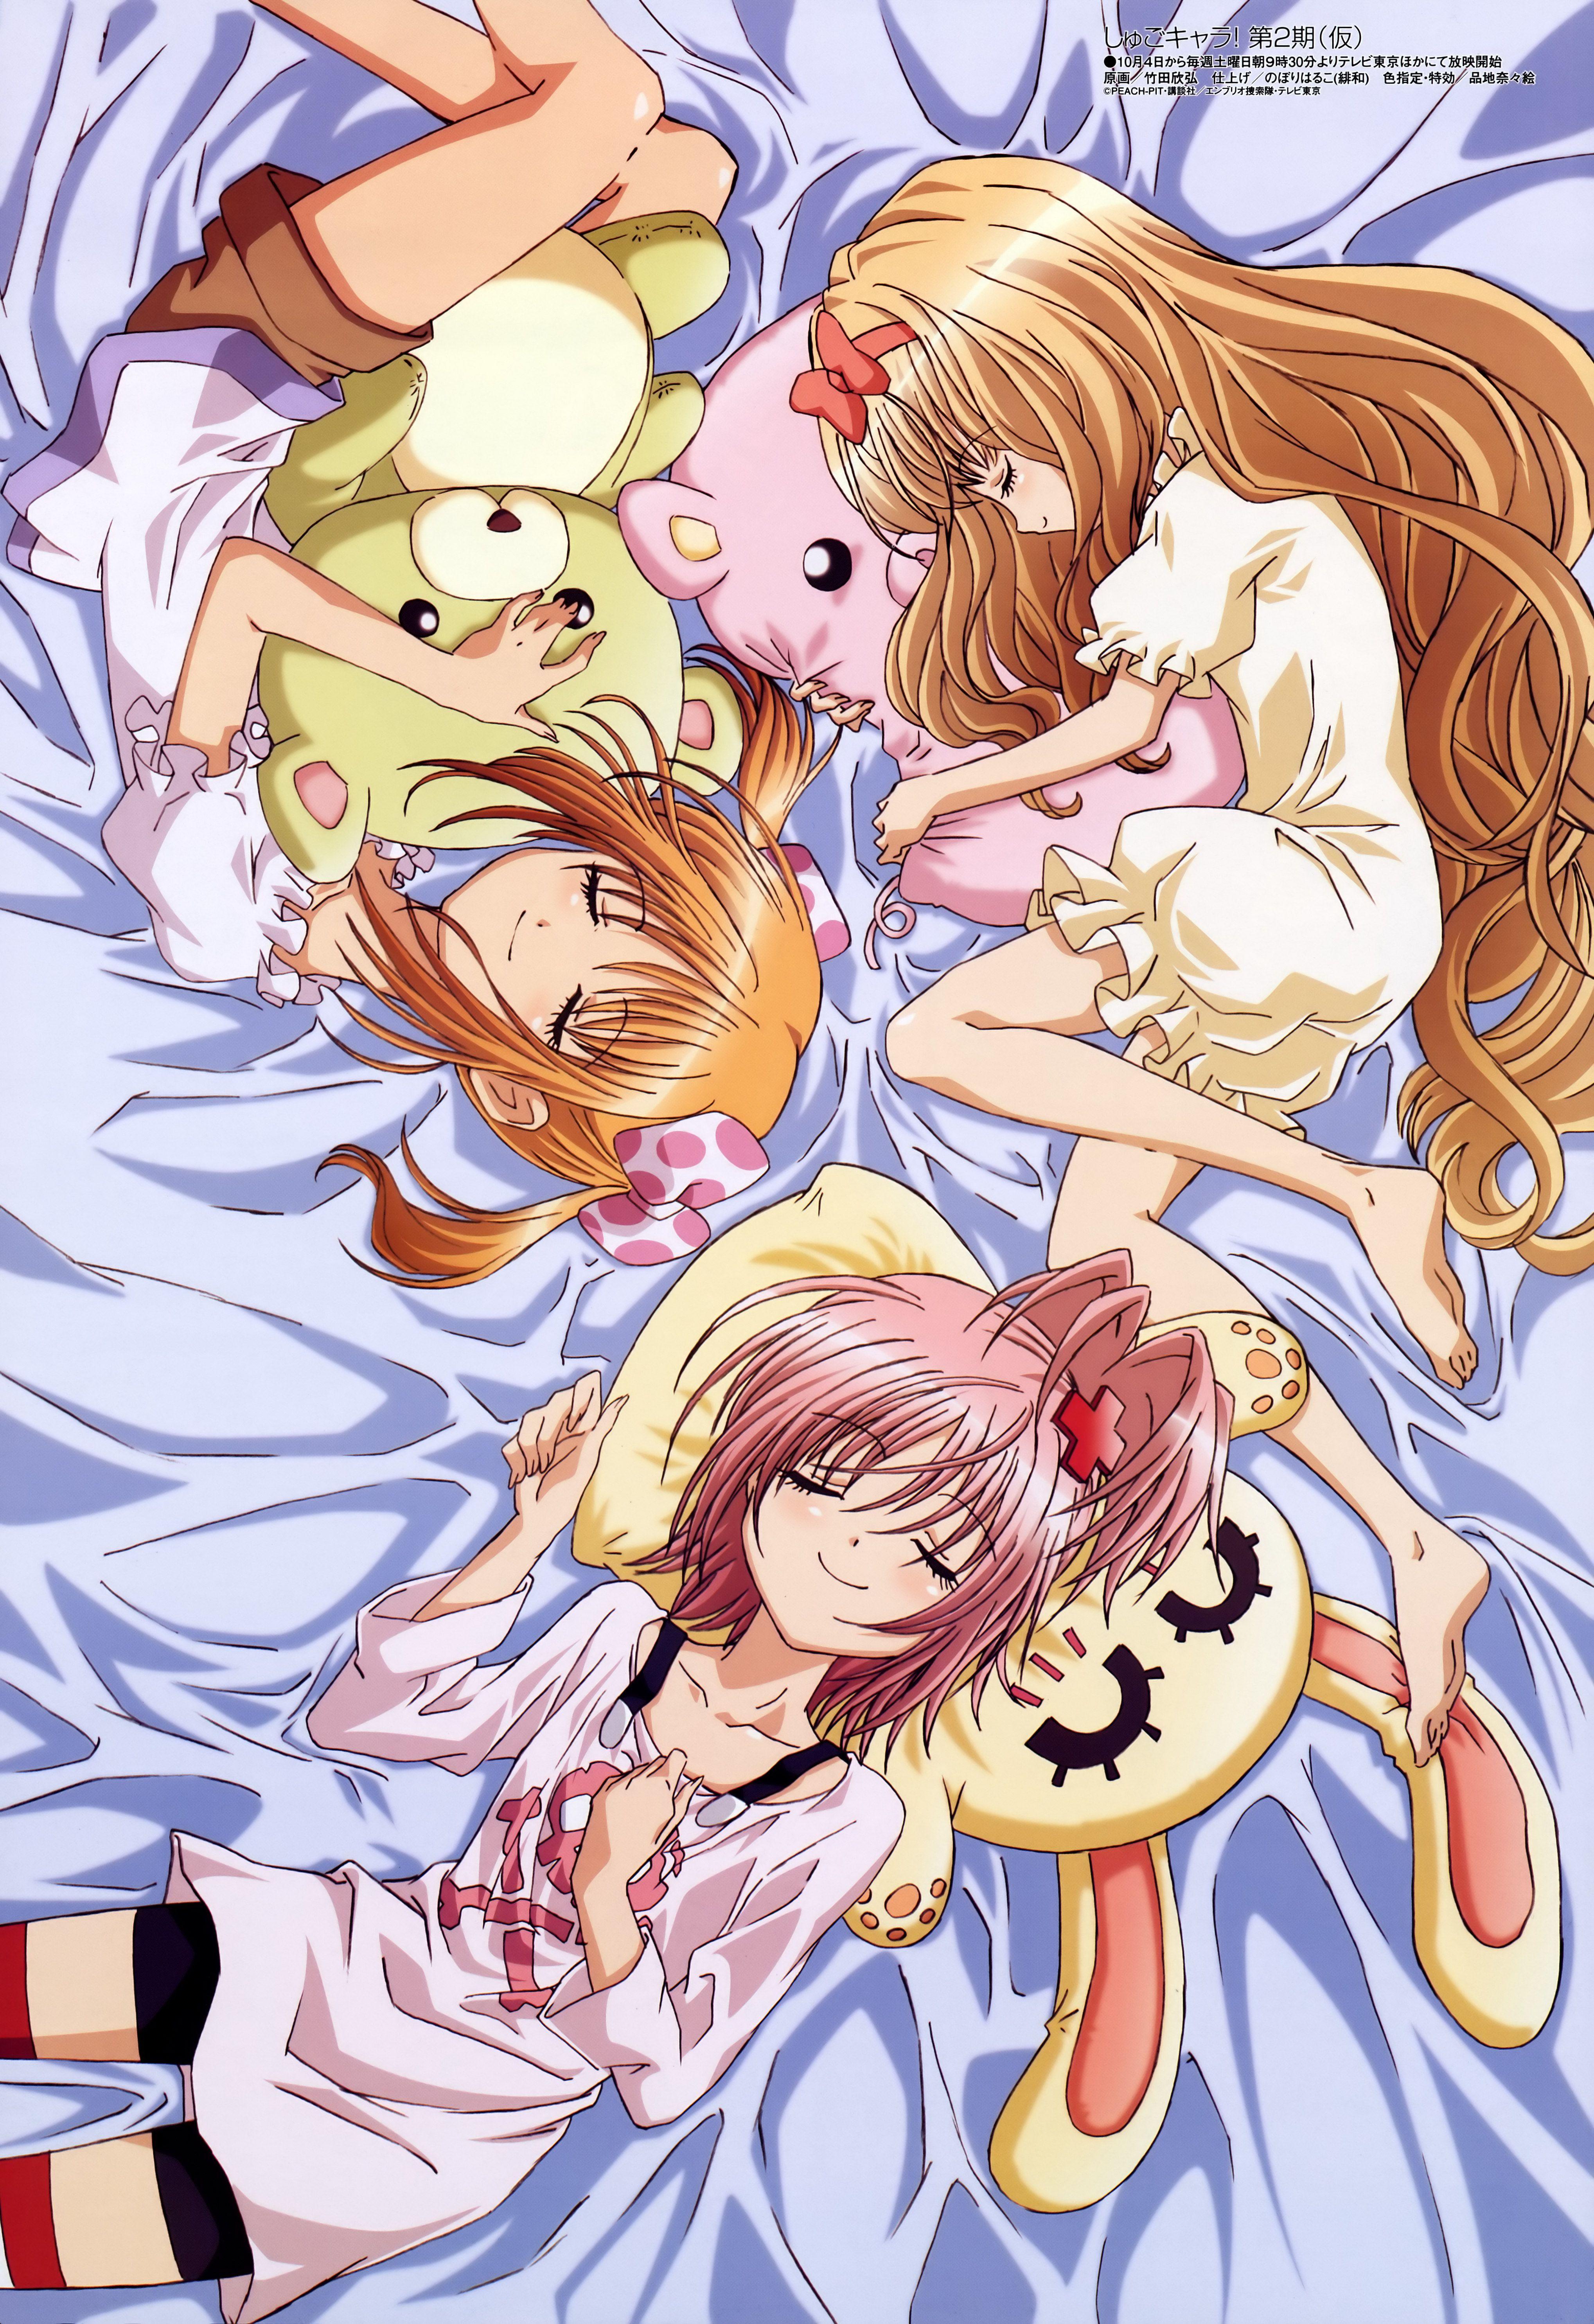 Anime like shugo chara yahoo dating